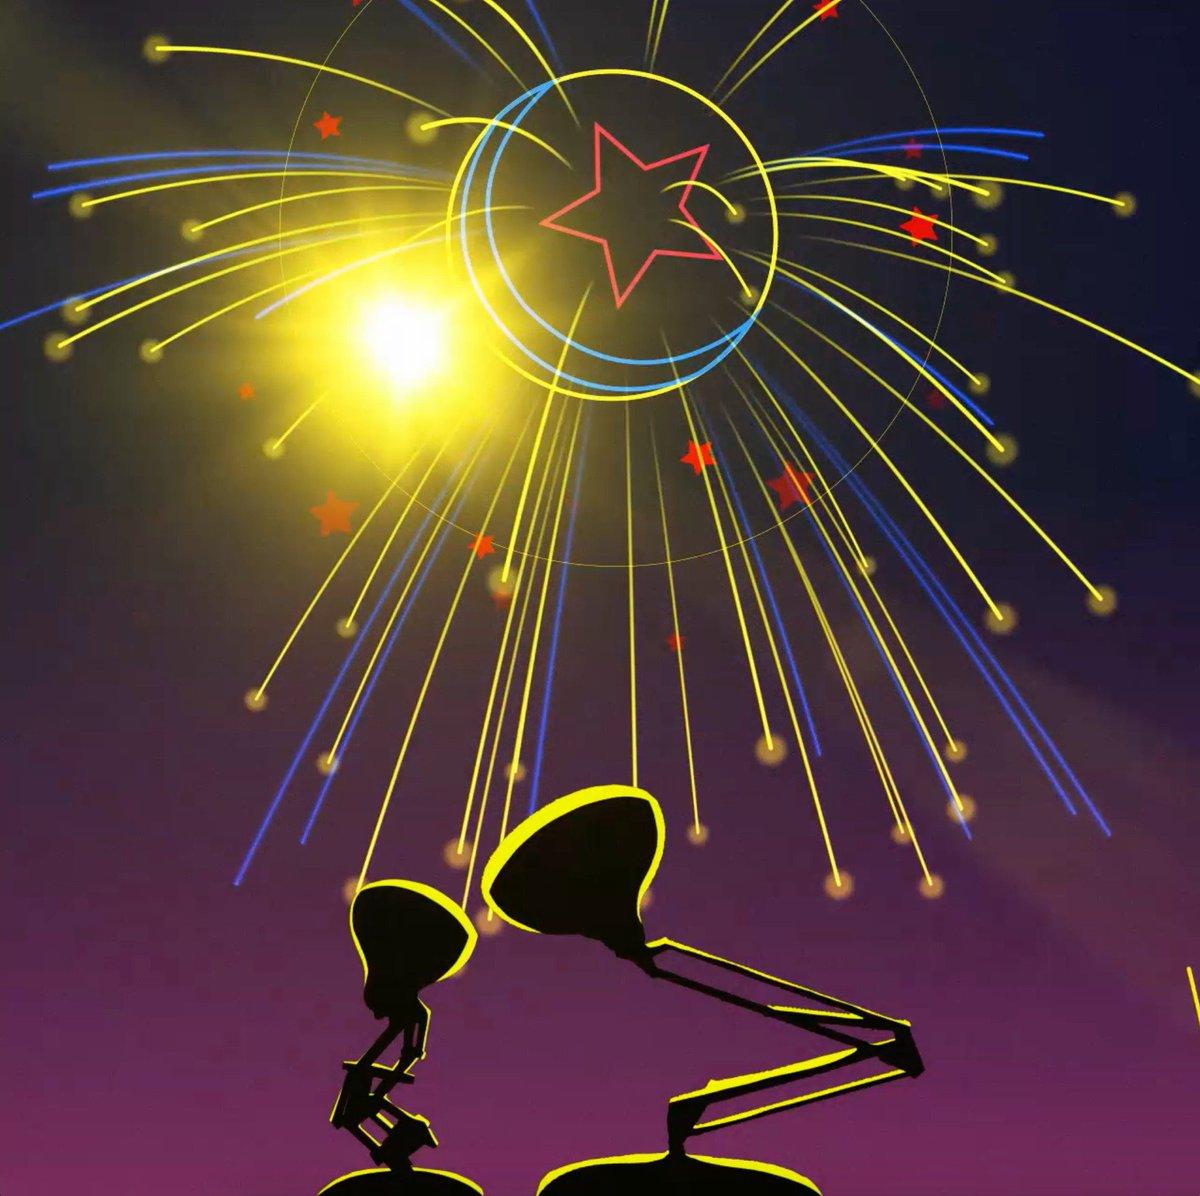 Happy #FourthOfJuly from Pixar!